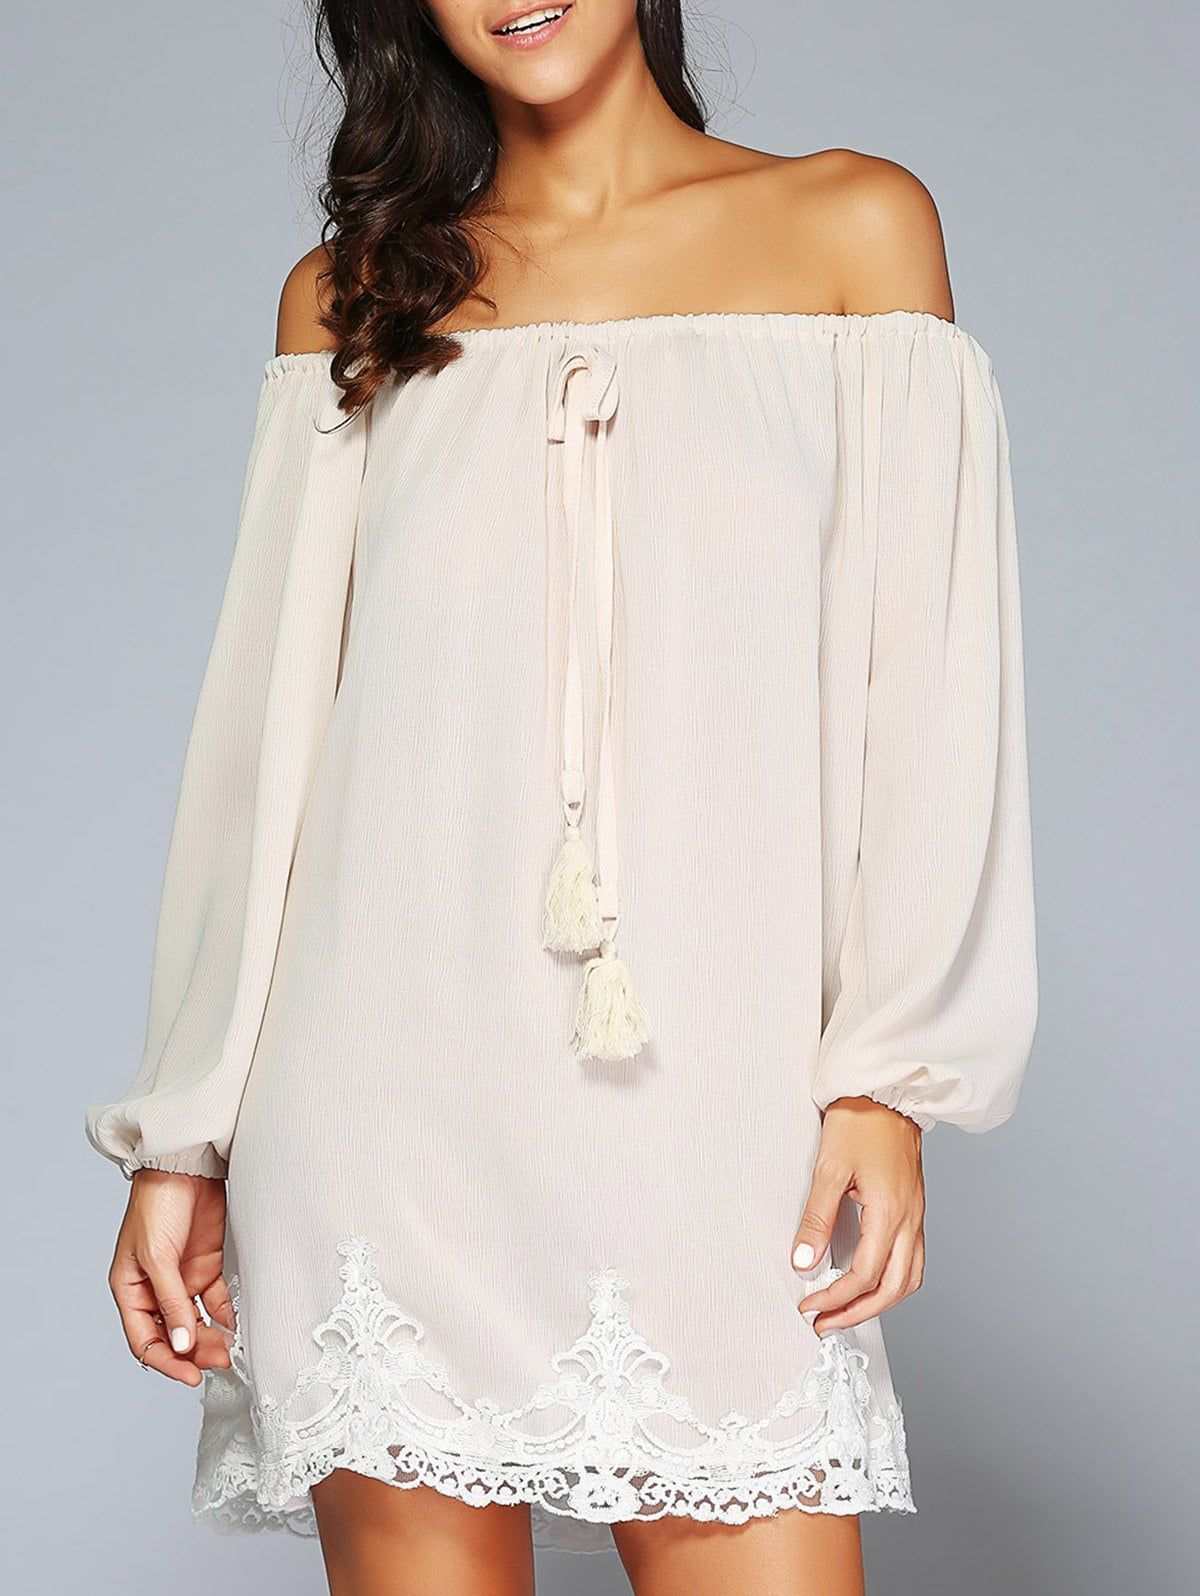 de0cc9a841 Off The Shoulder Patched Long Sleeve Cream Casual Dress - APRICOT M ...